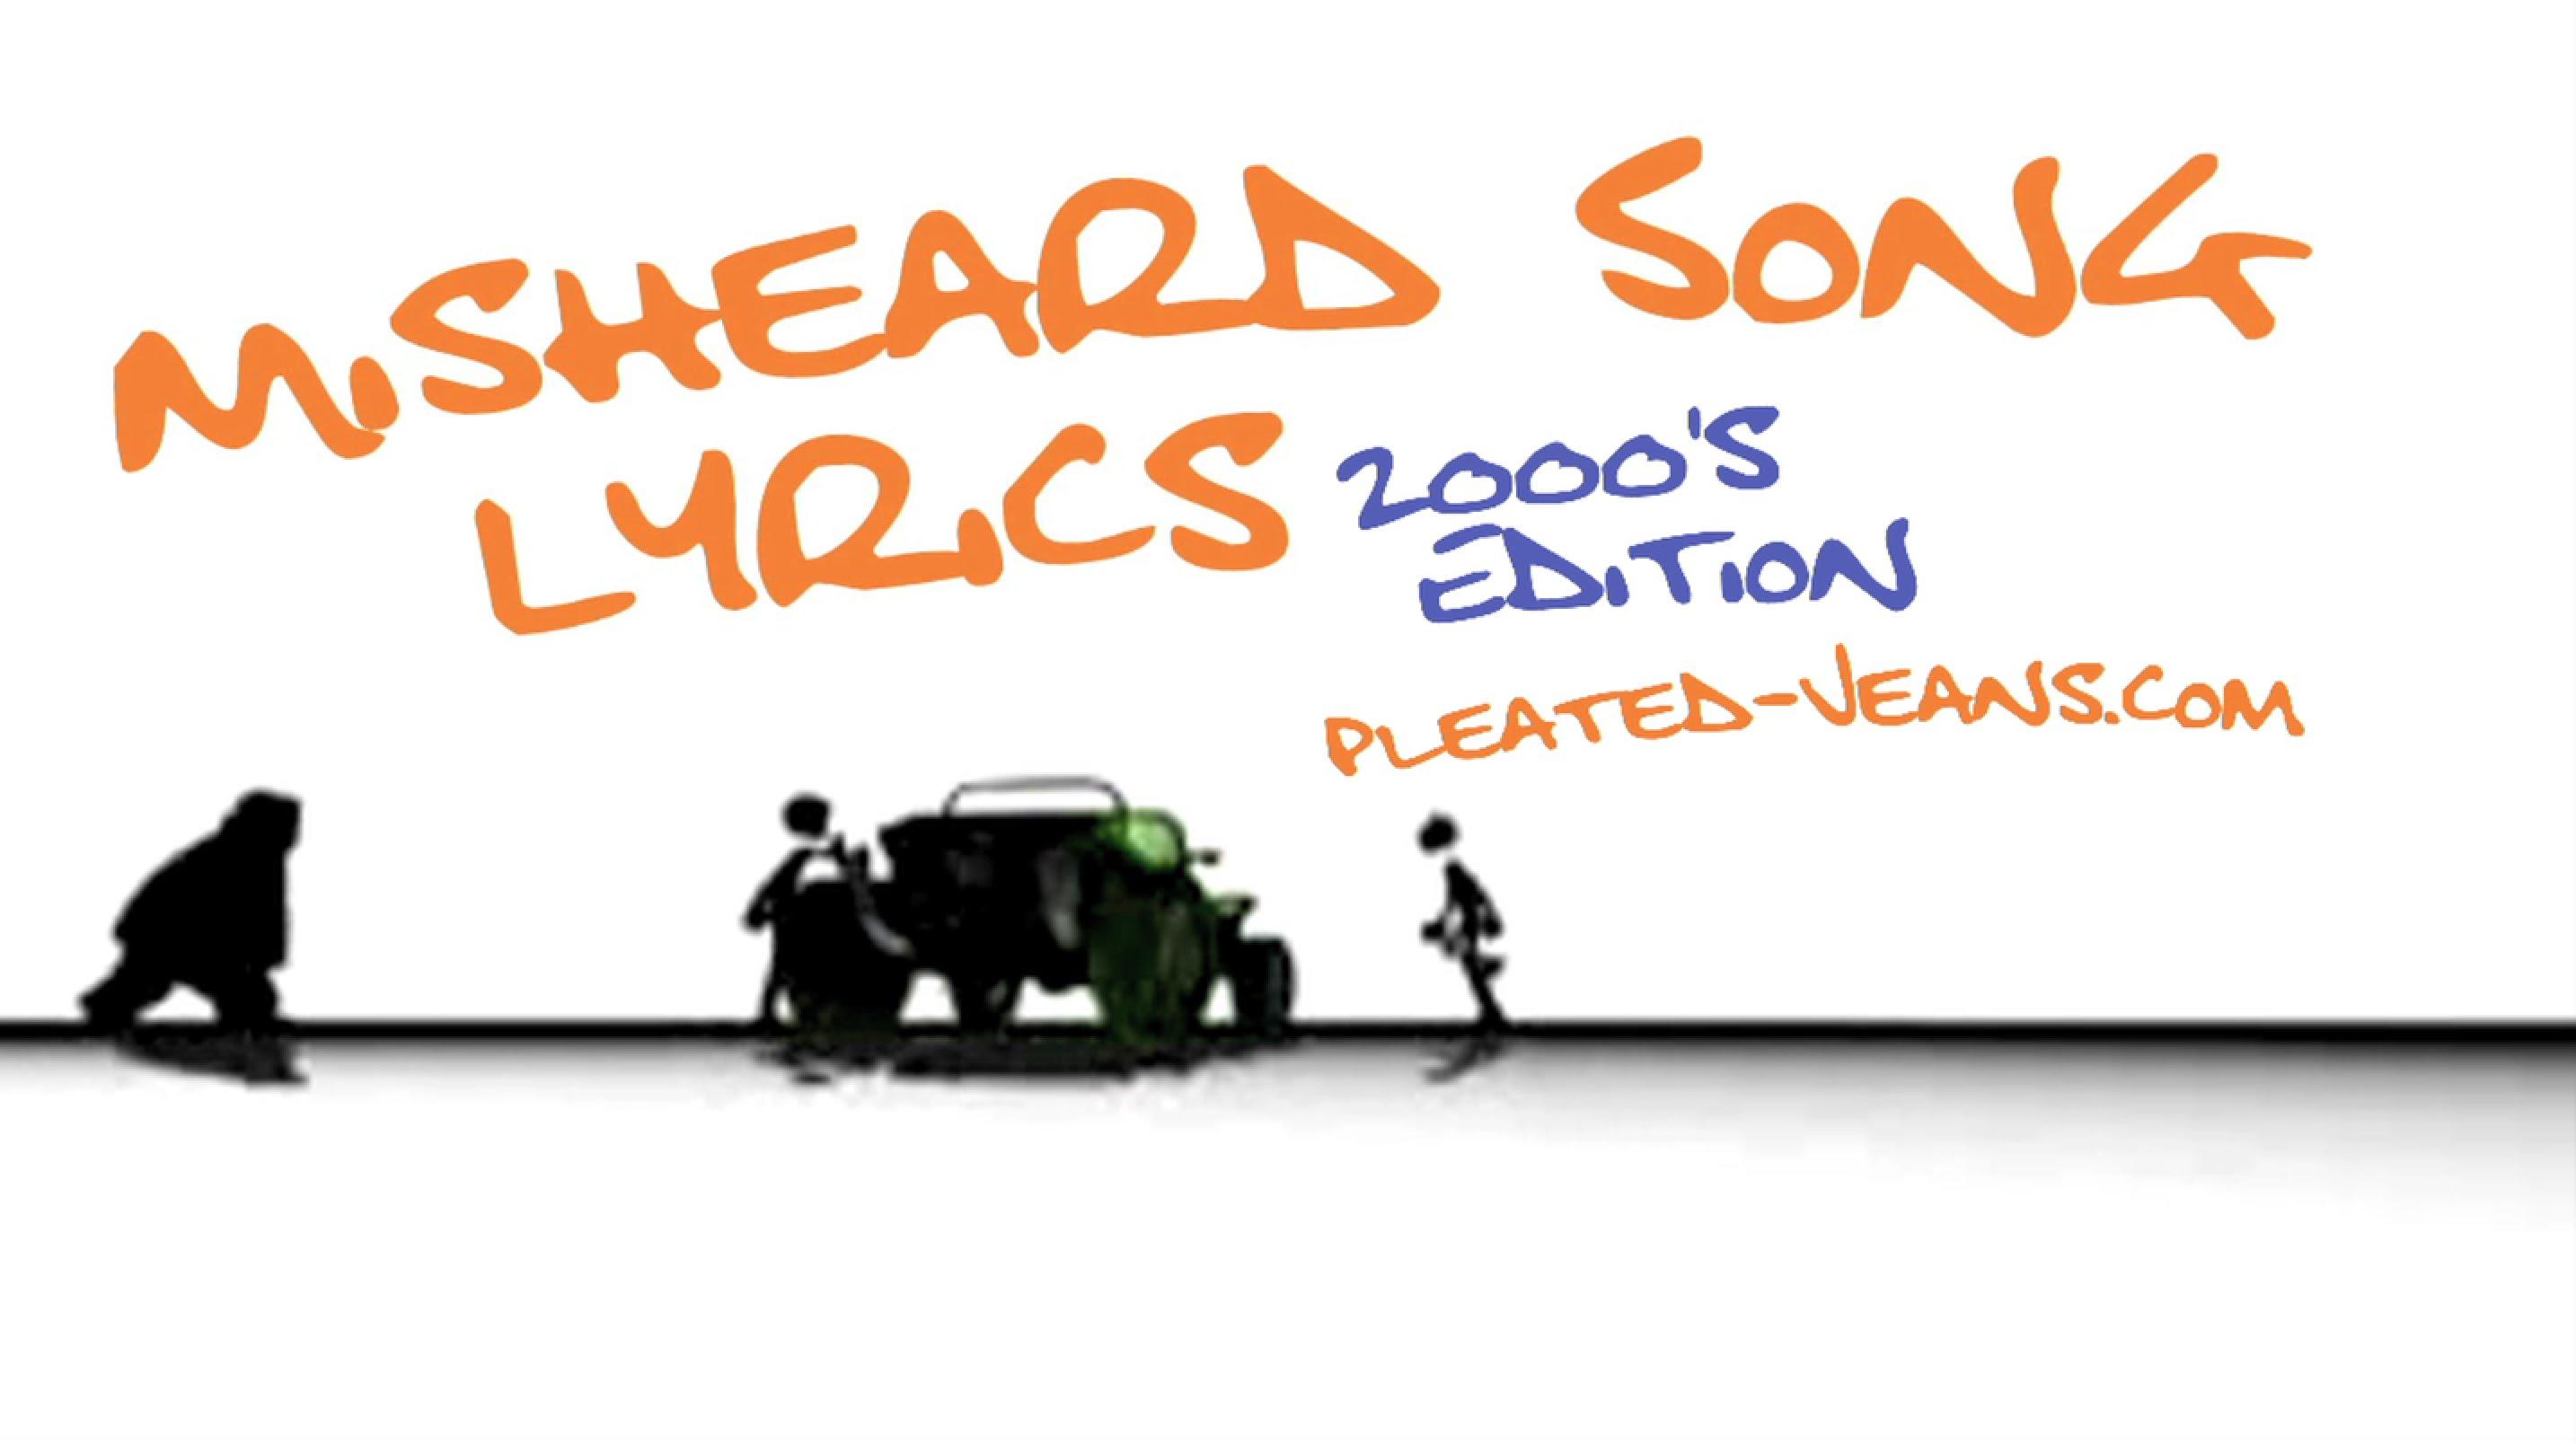 Hot shot lyrics